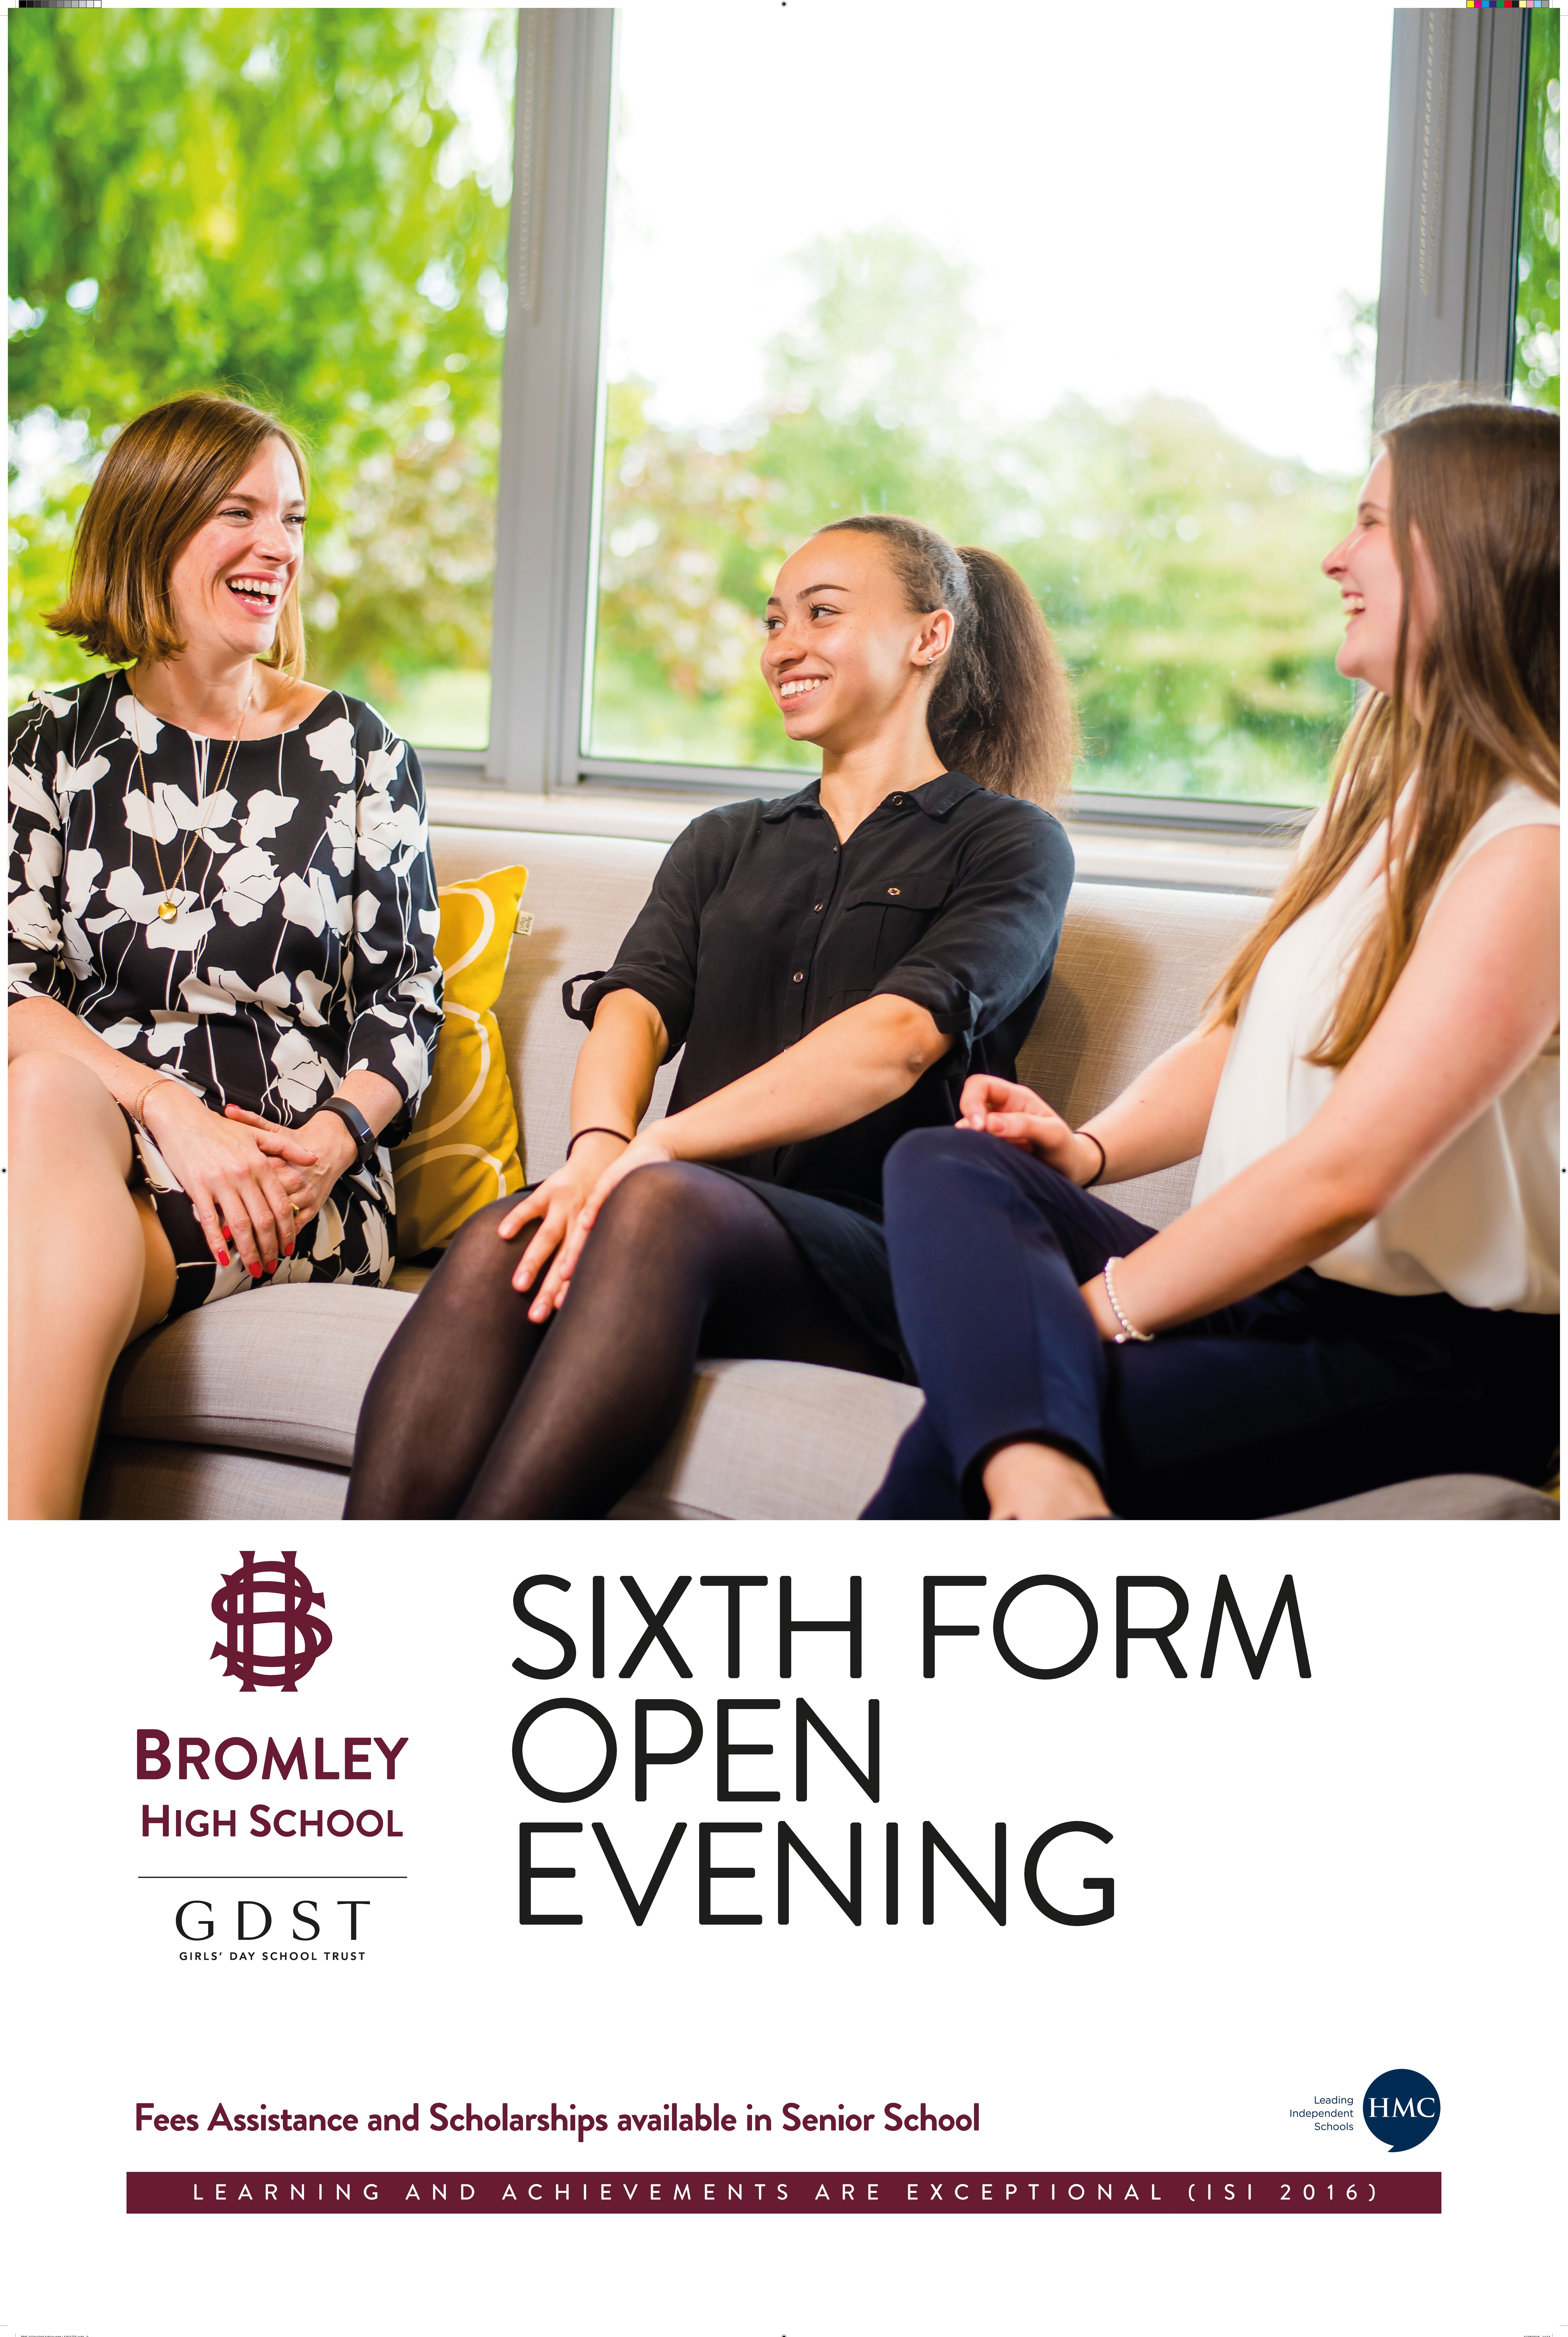 Bromley High School Sixth Form Open Evening